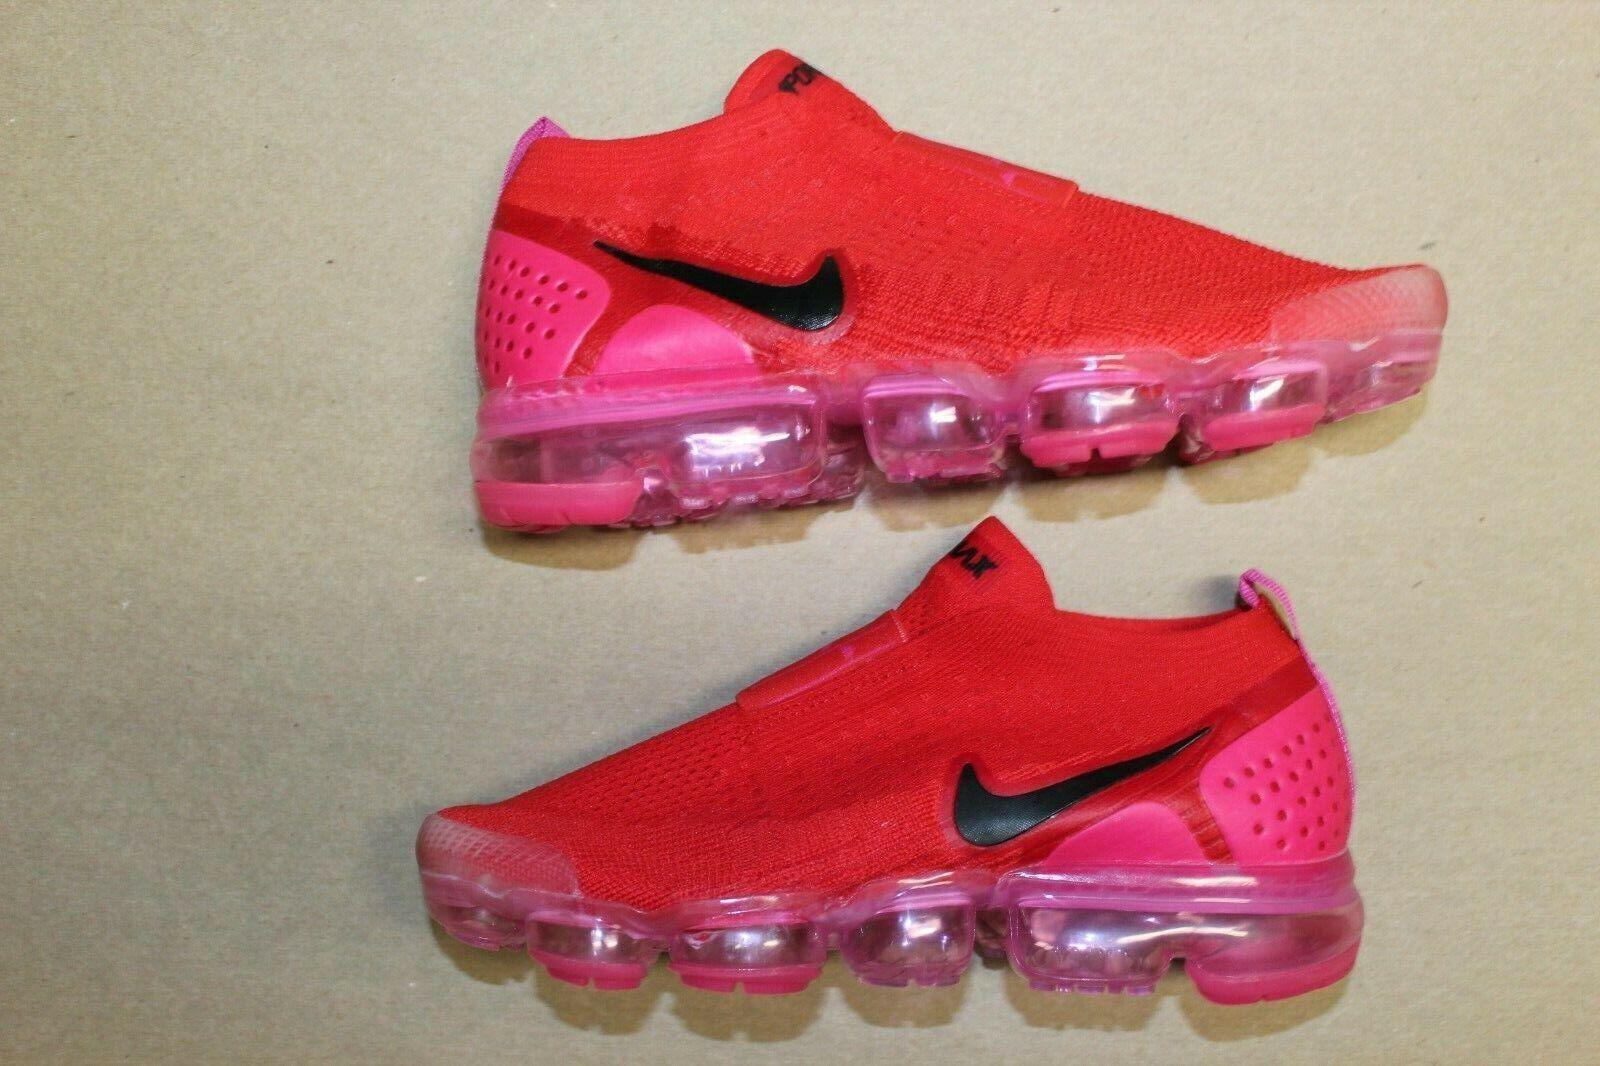 Women's Nike Air Vapormax Flyknit Moc 2 Laceless Size 8 Red Pink Black